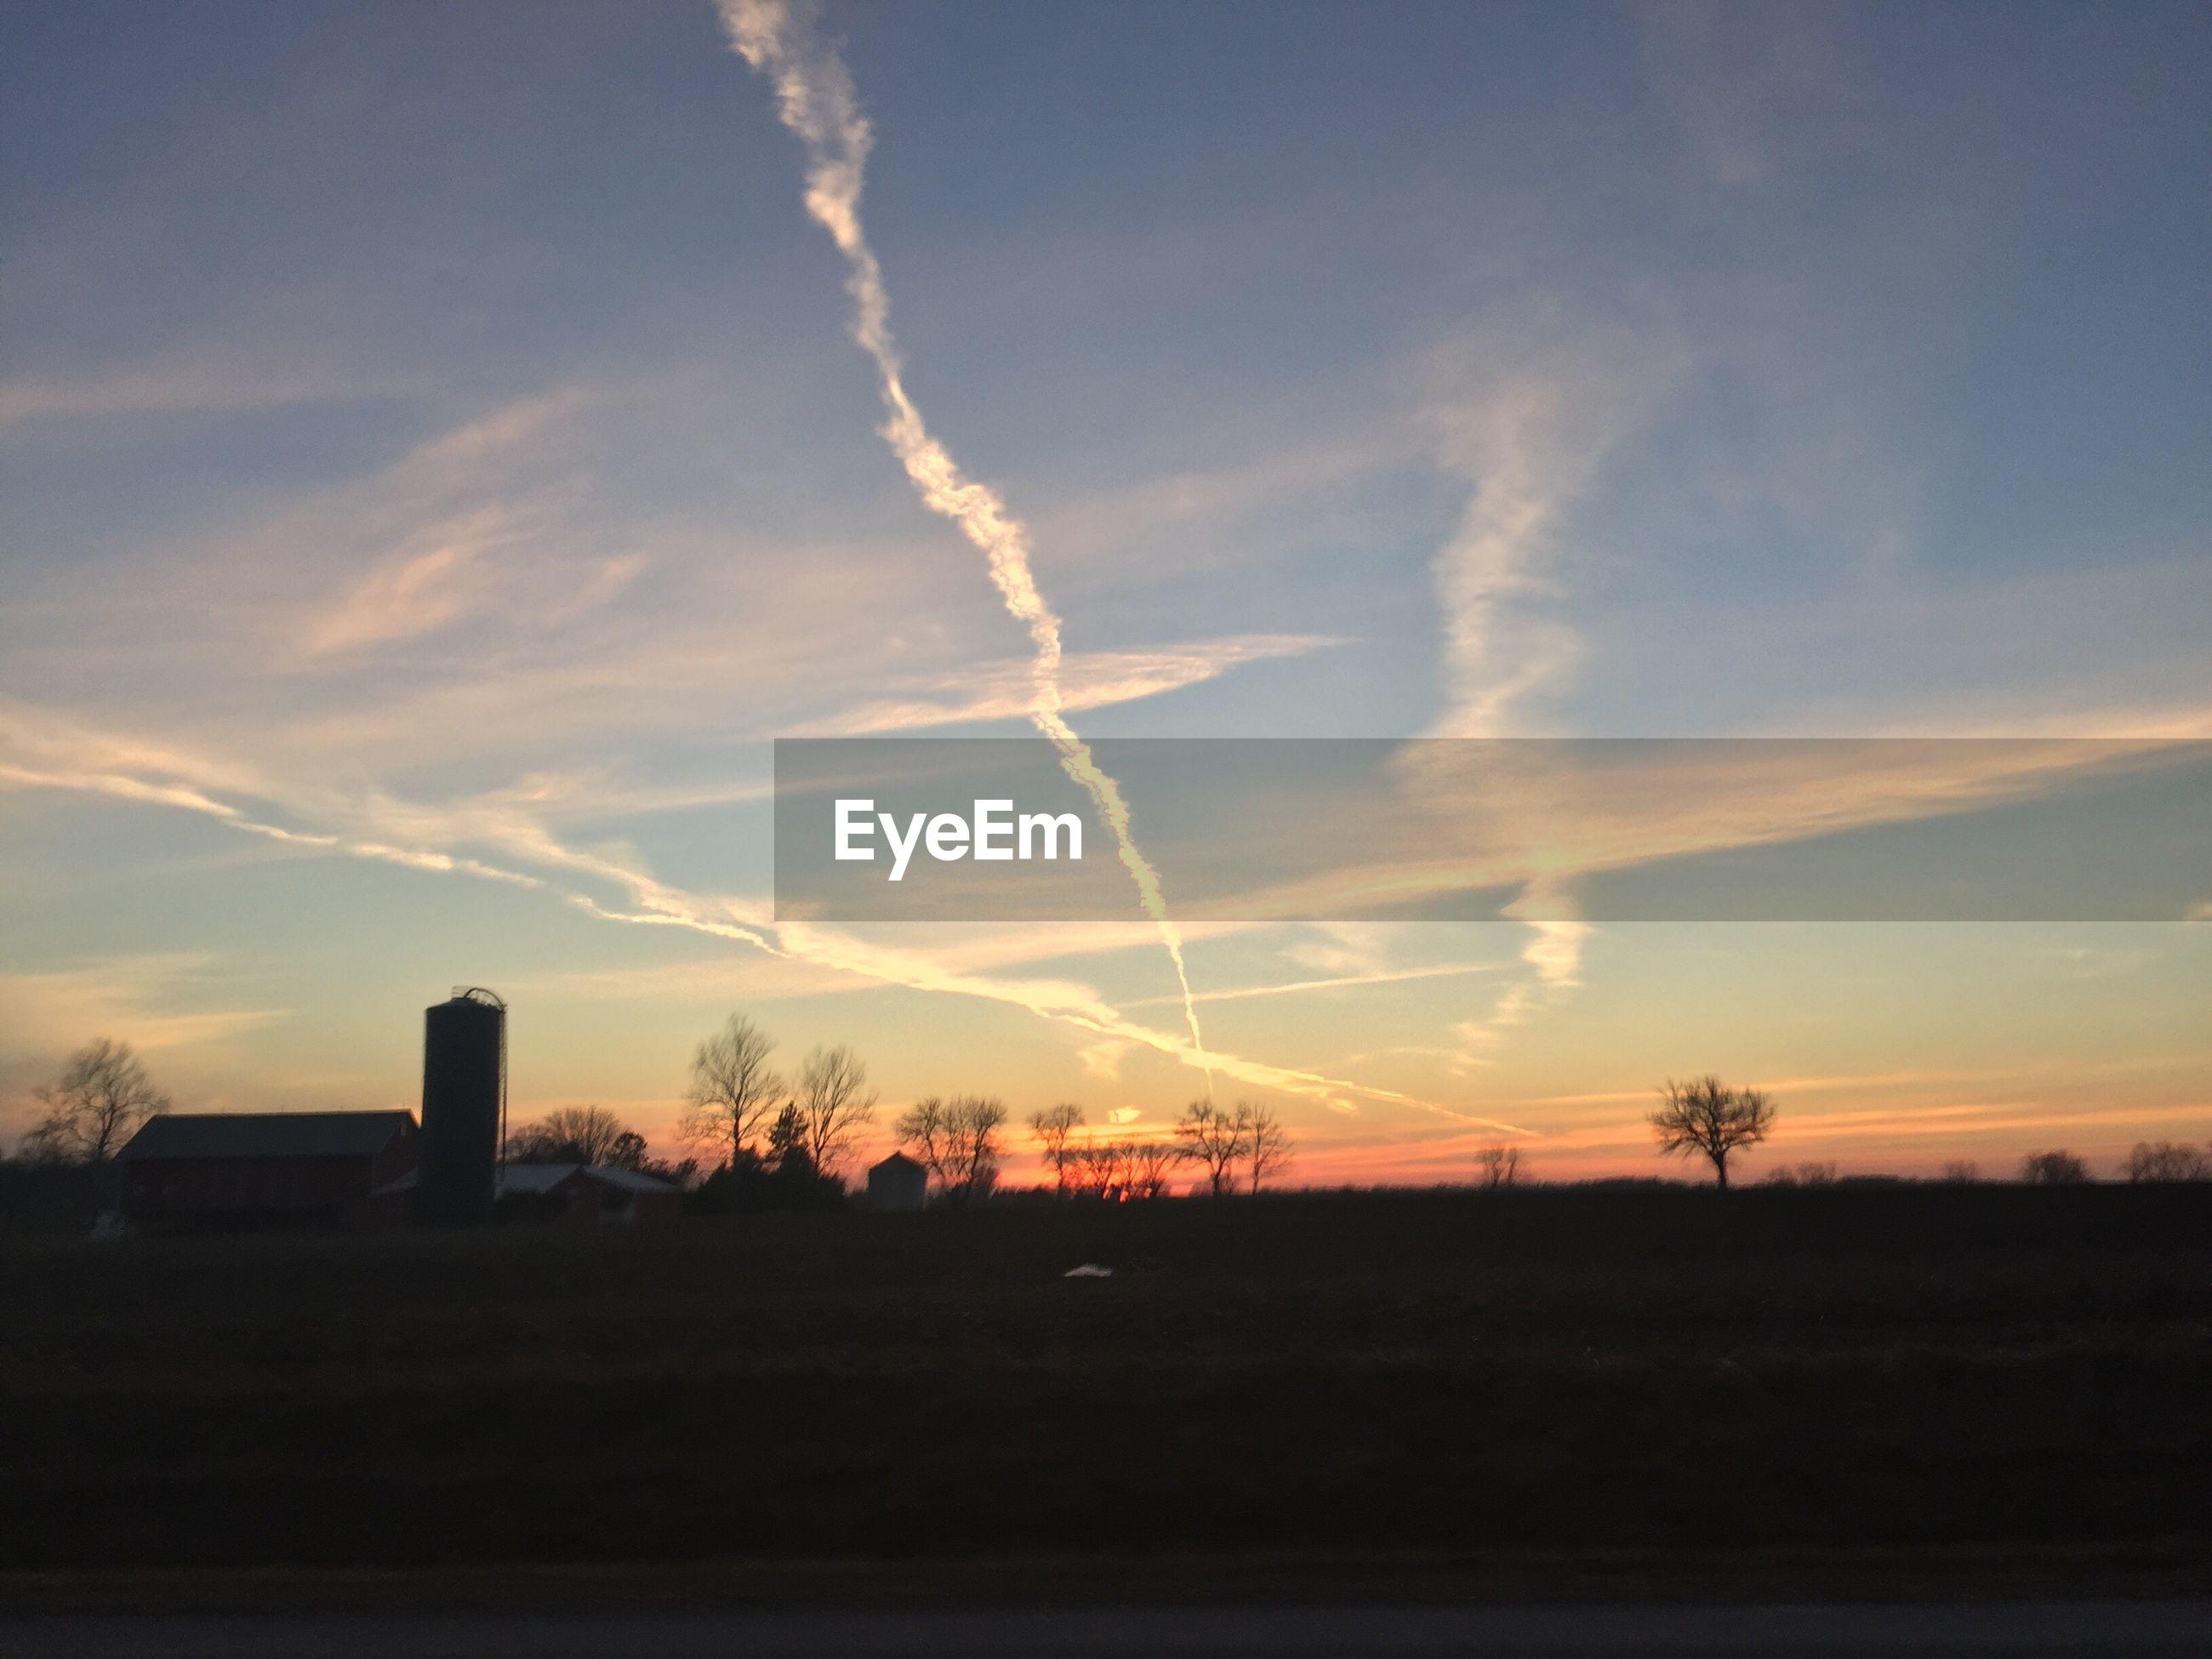 sunset, sky, landscape, field, silhouette, tranquil scene, tranquility, scenics, beauty in nature, tree, rural scene, nature, cloud - sky, cloud, idyllic, outdoors, no people, dusk, orange color, non-urban scene